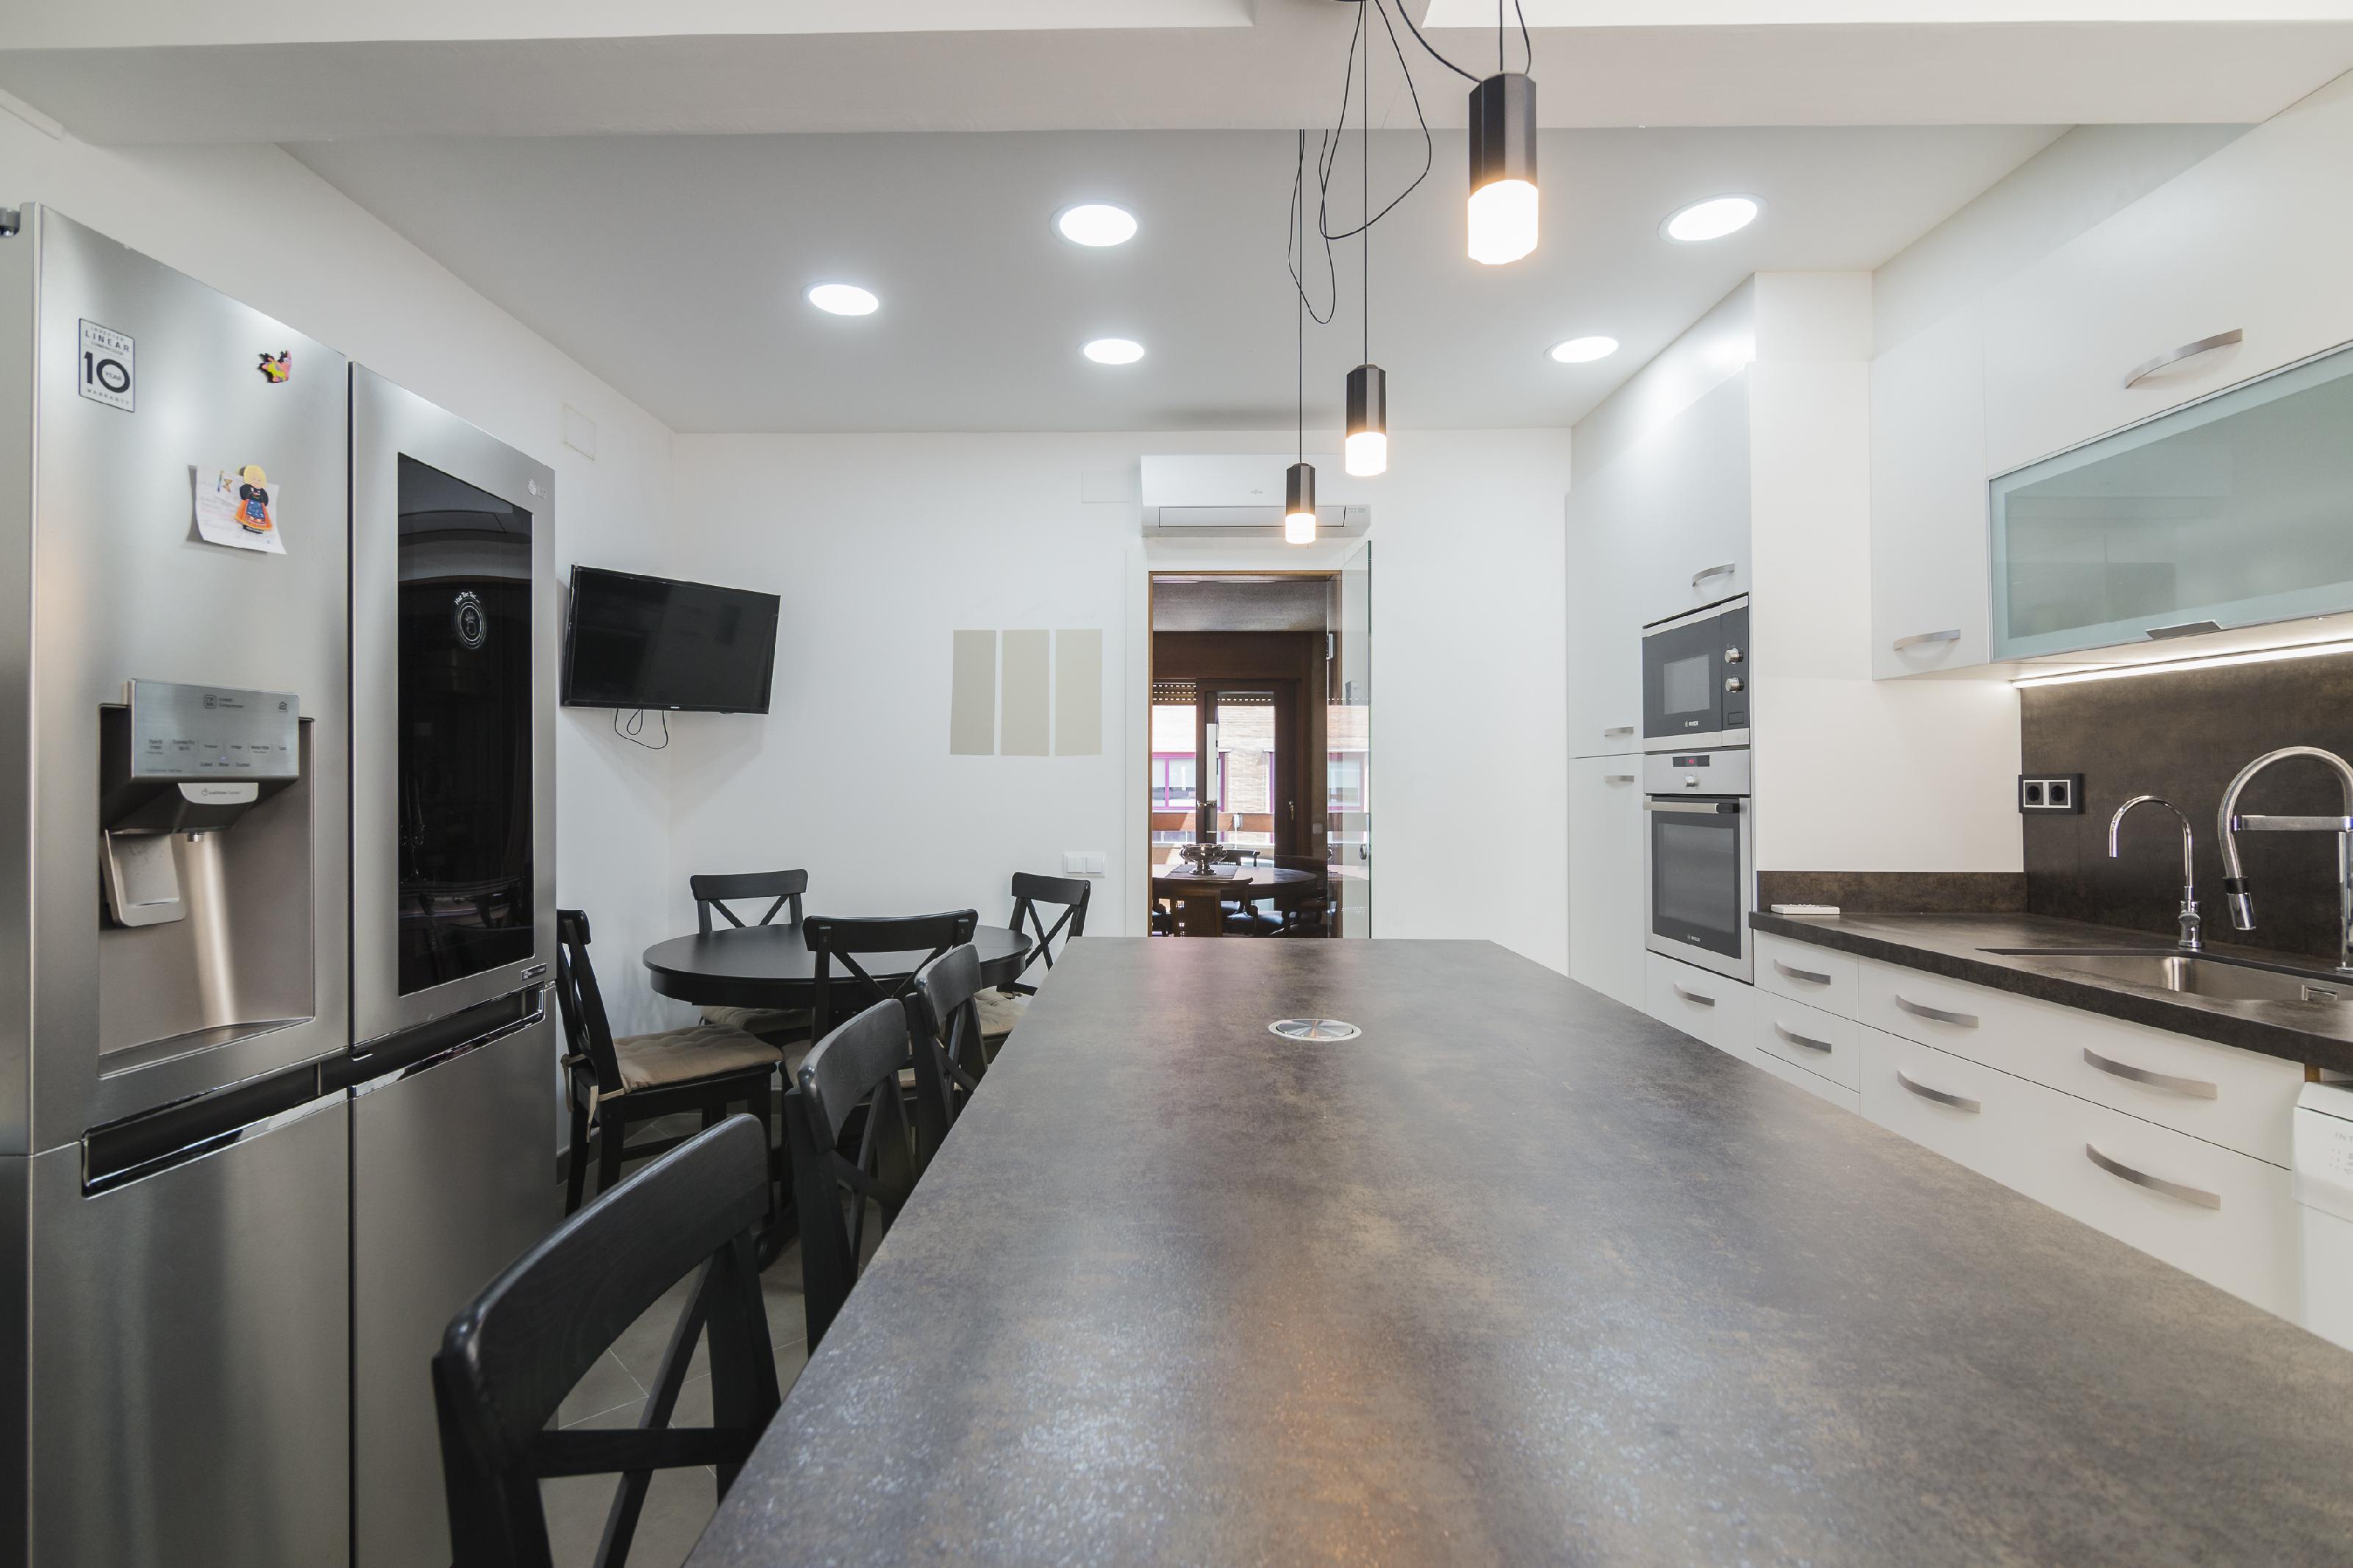 249856 Flat for sale in Sarrià-Sant Gervasi, Sant Gervasi-Galvany 17